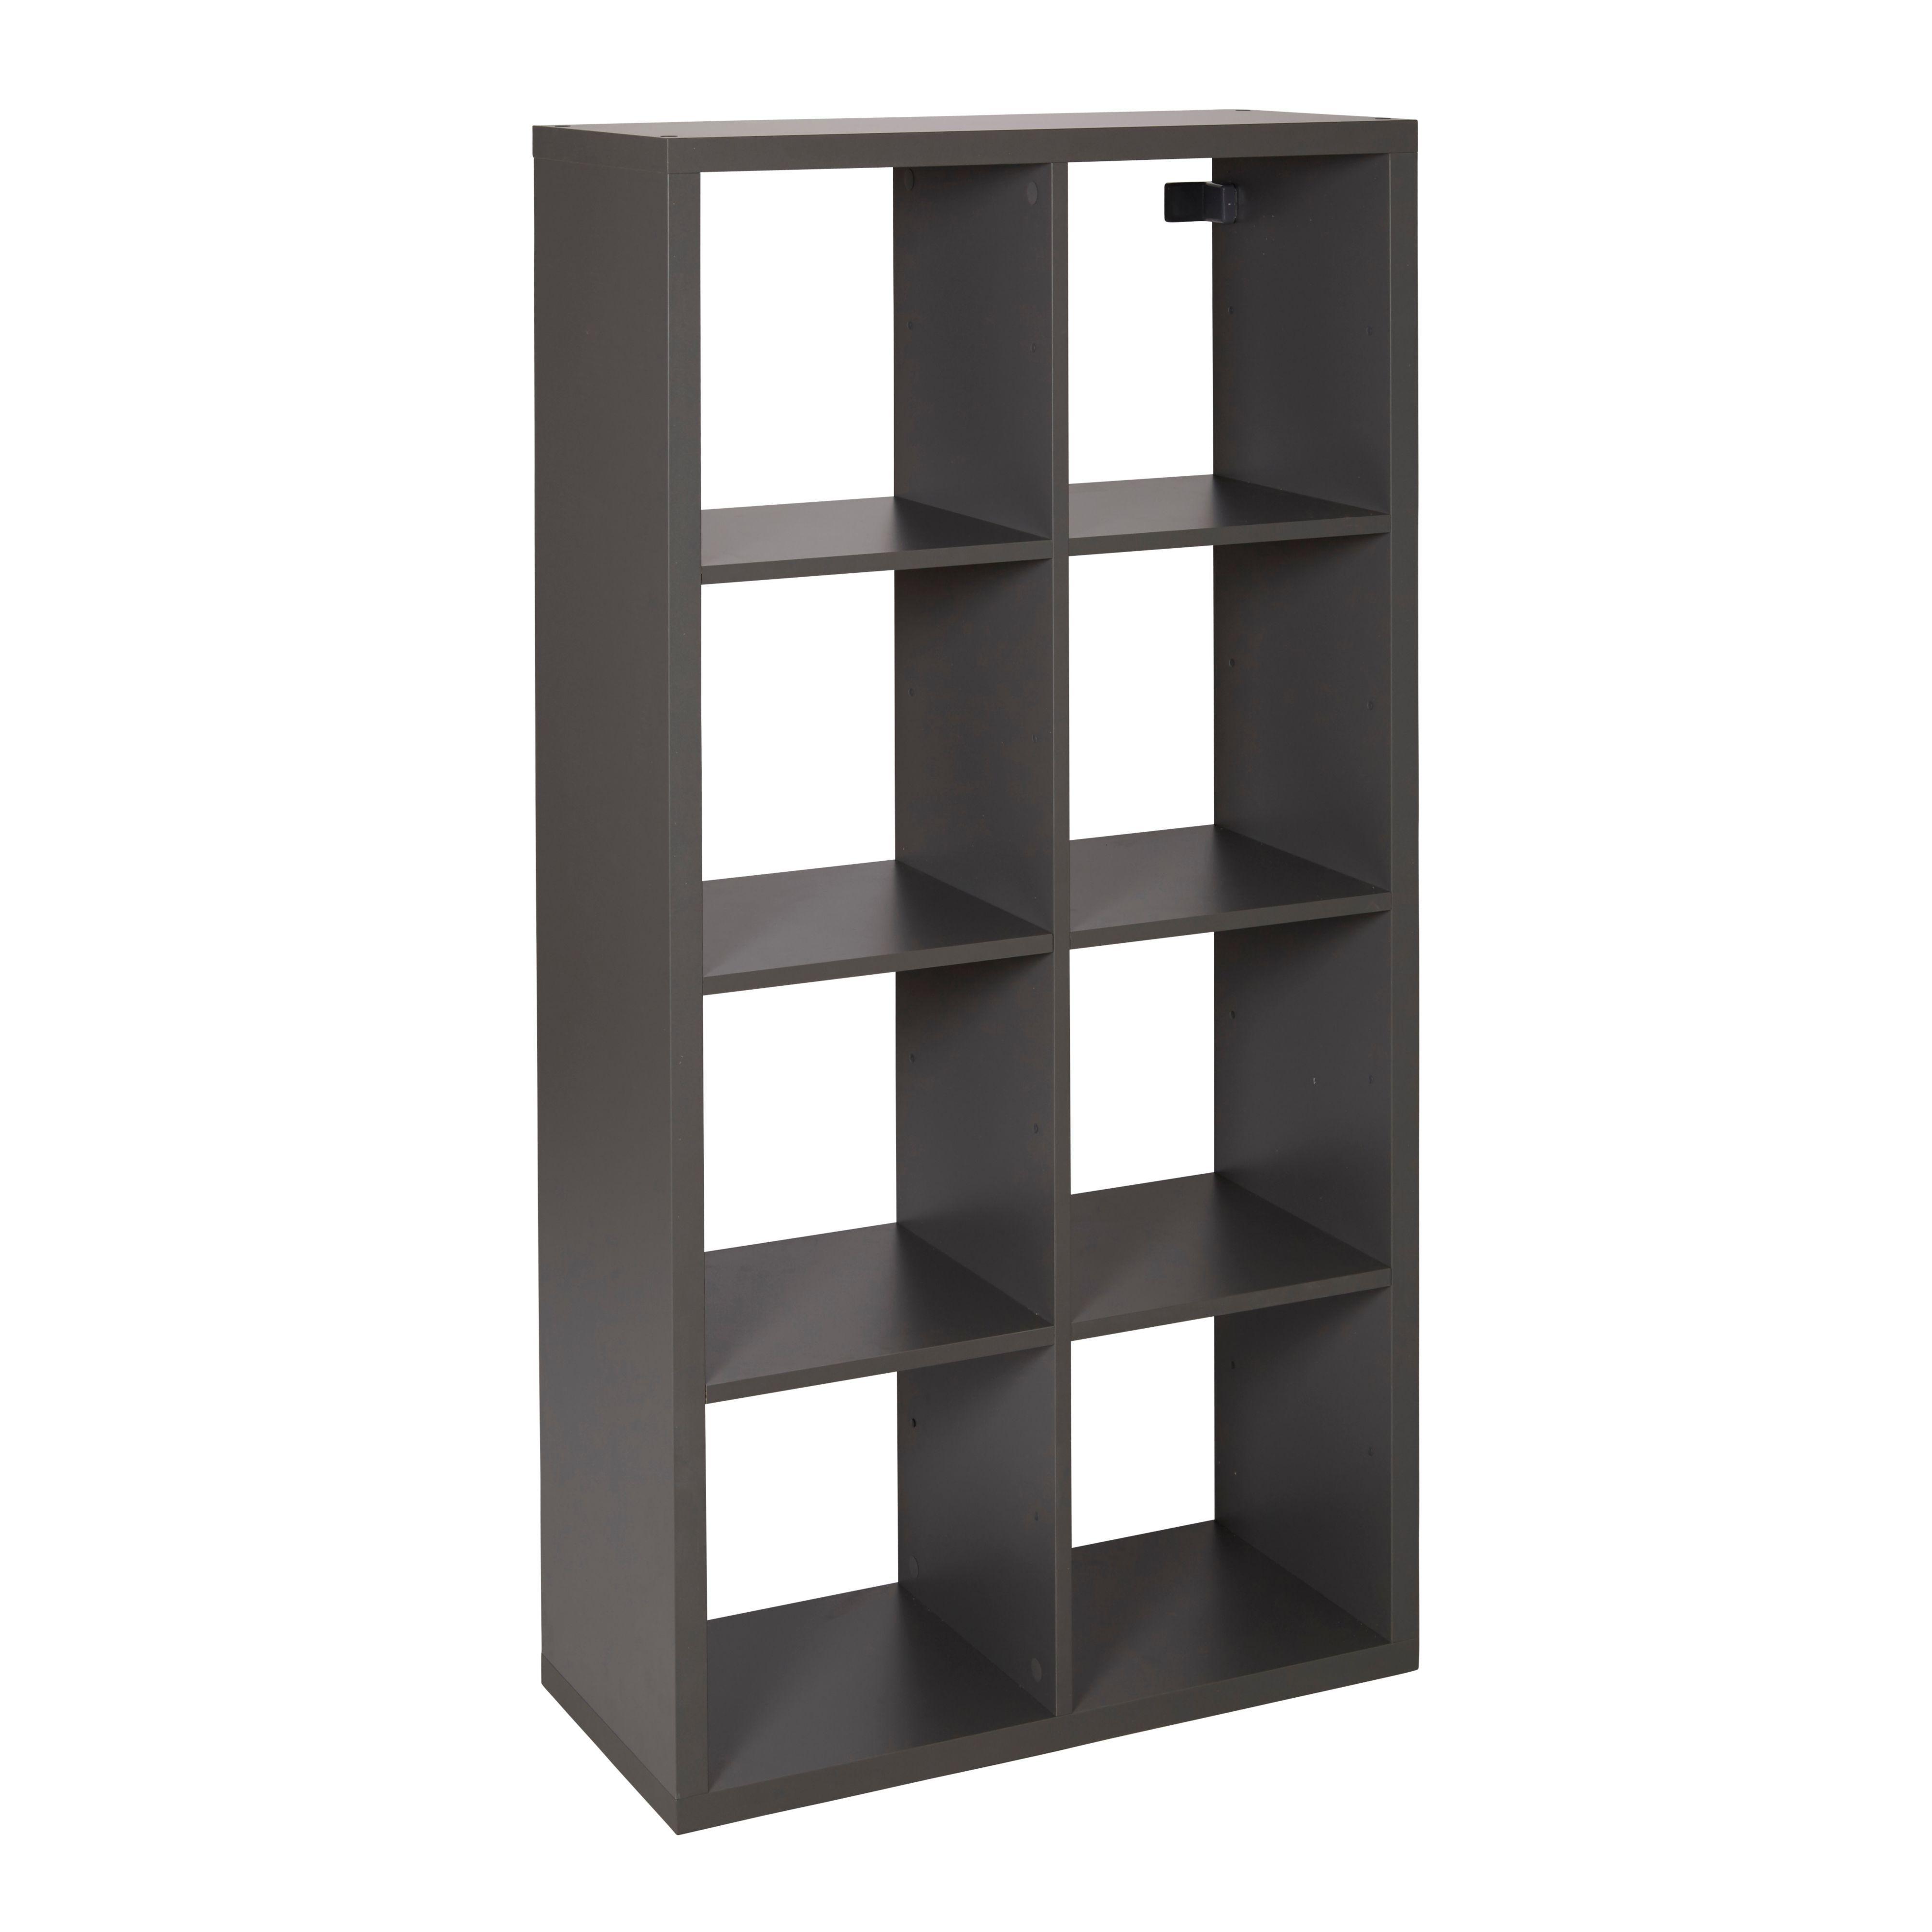 Form Mixxit Grey 8 Cube Shelving Unit (h)1420mm (w)740mm